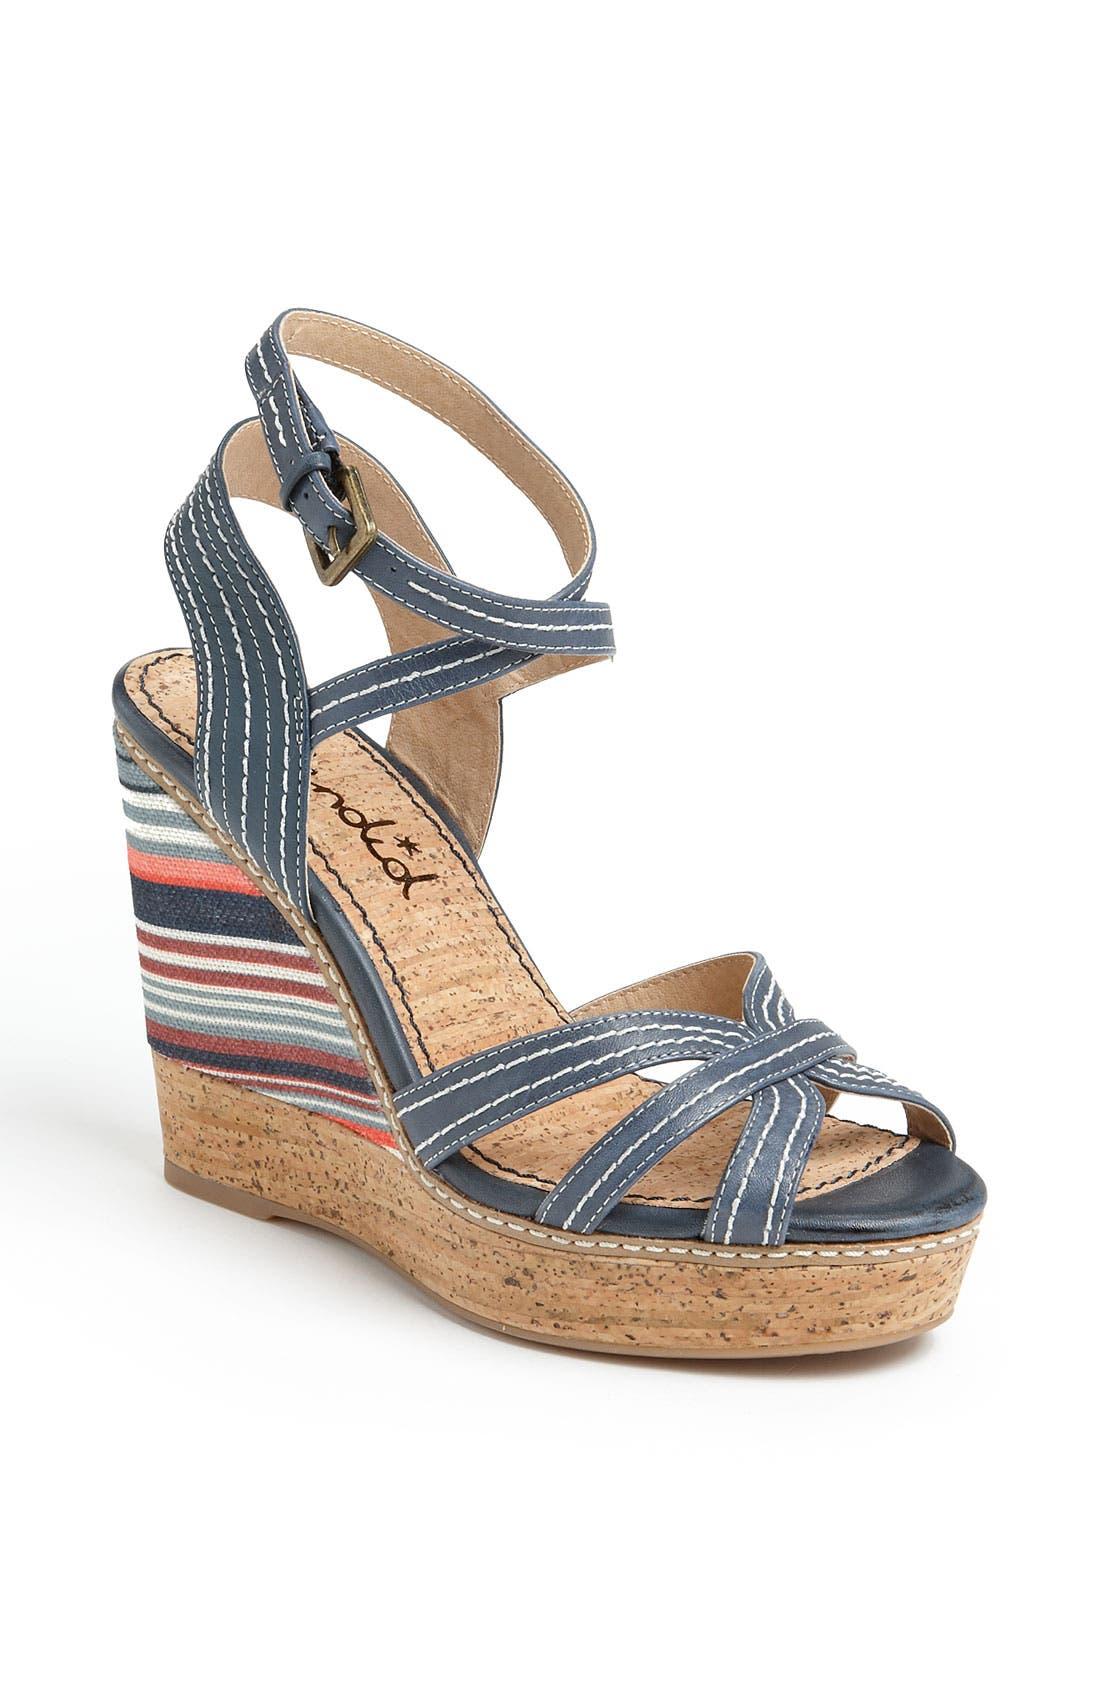 Main Image - Splendid 'Kayla' Wedge Sandal